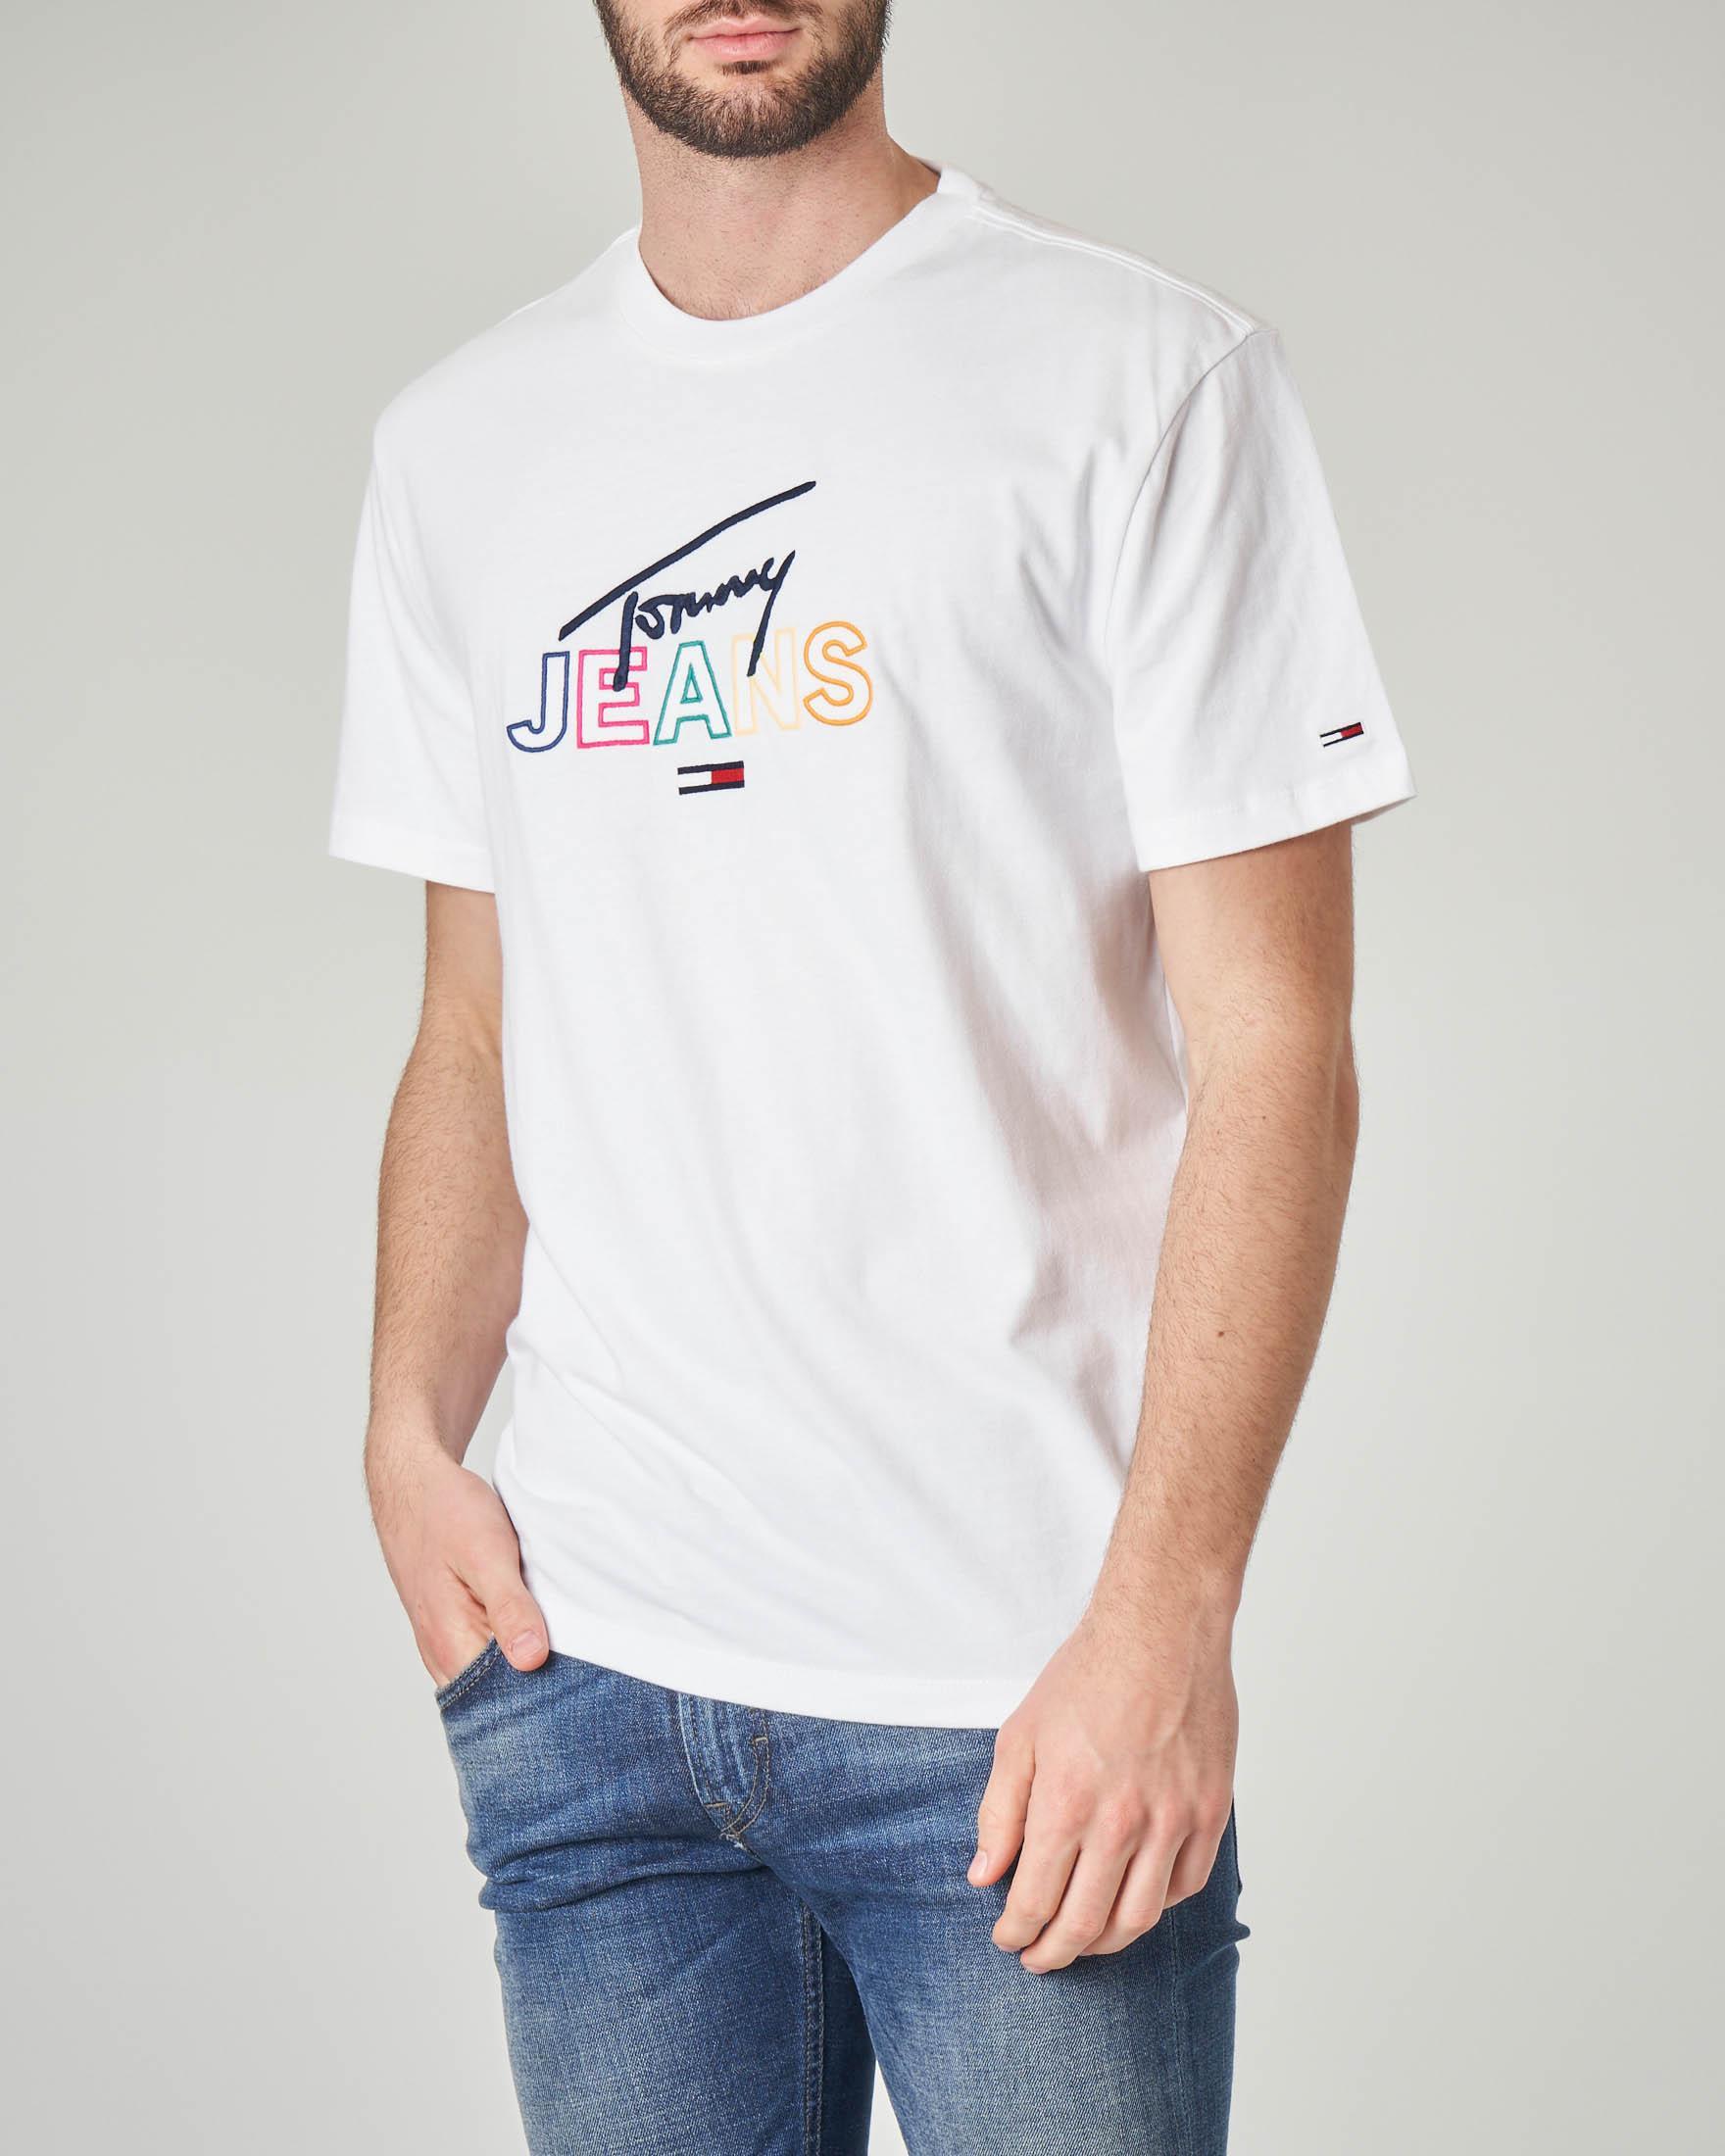 T-shirt bianca con logo in corsivo